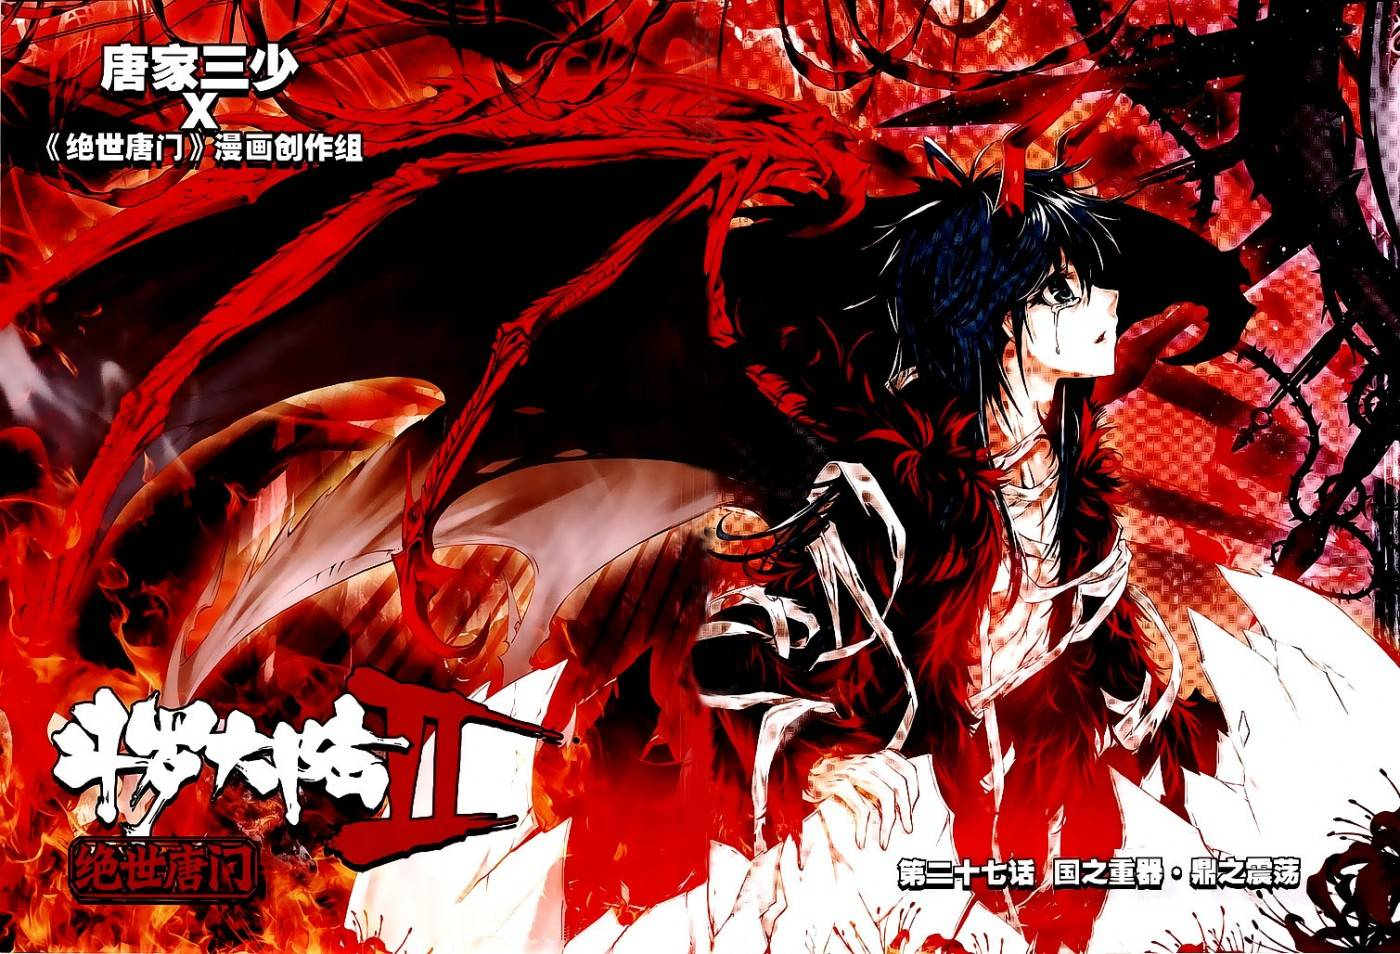 http://c5.ninemanga.com/es_manga/33/16417/422679/0db6221b4c53369646ff603fcaa8981d.jpg Page 1